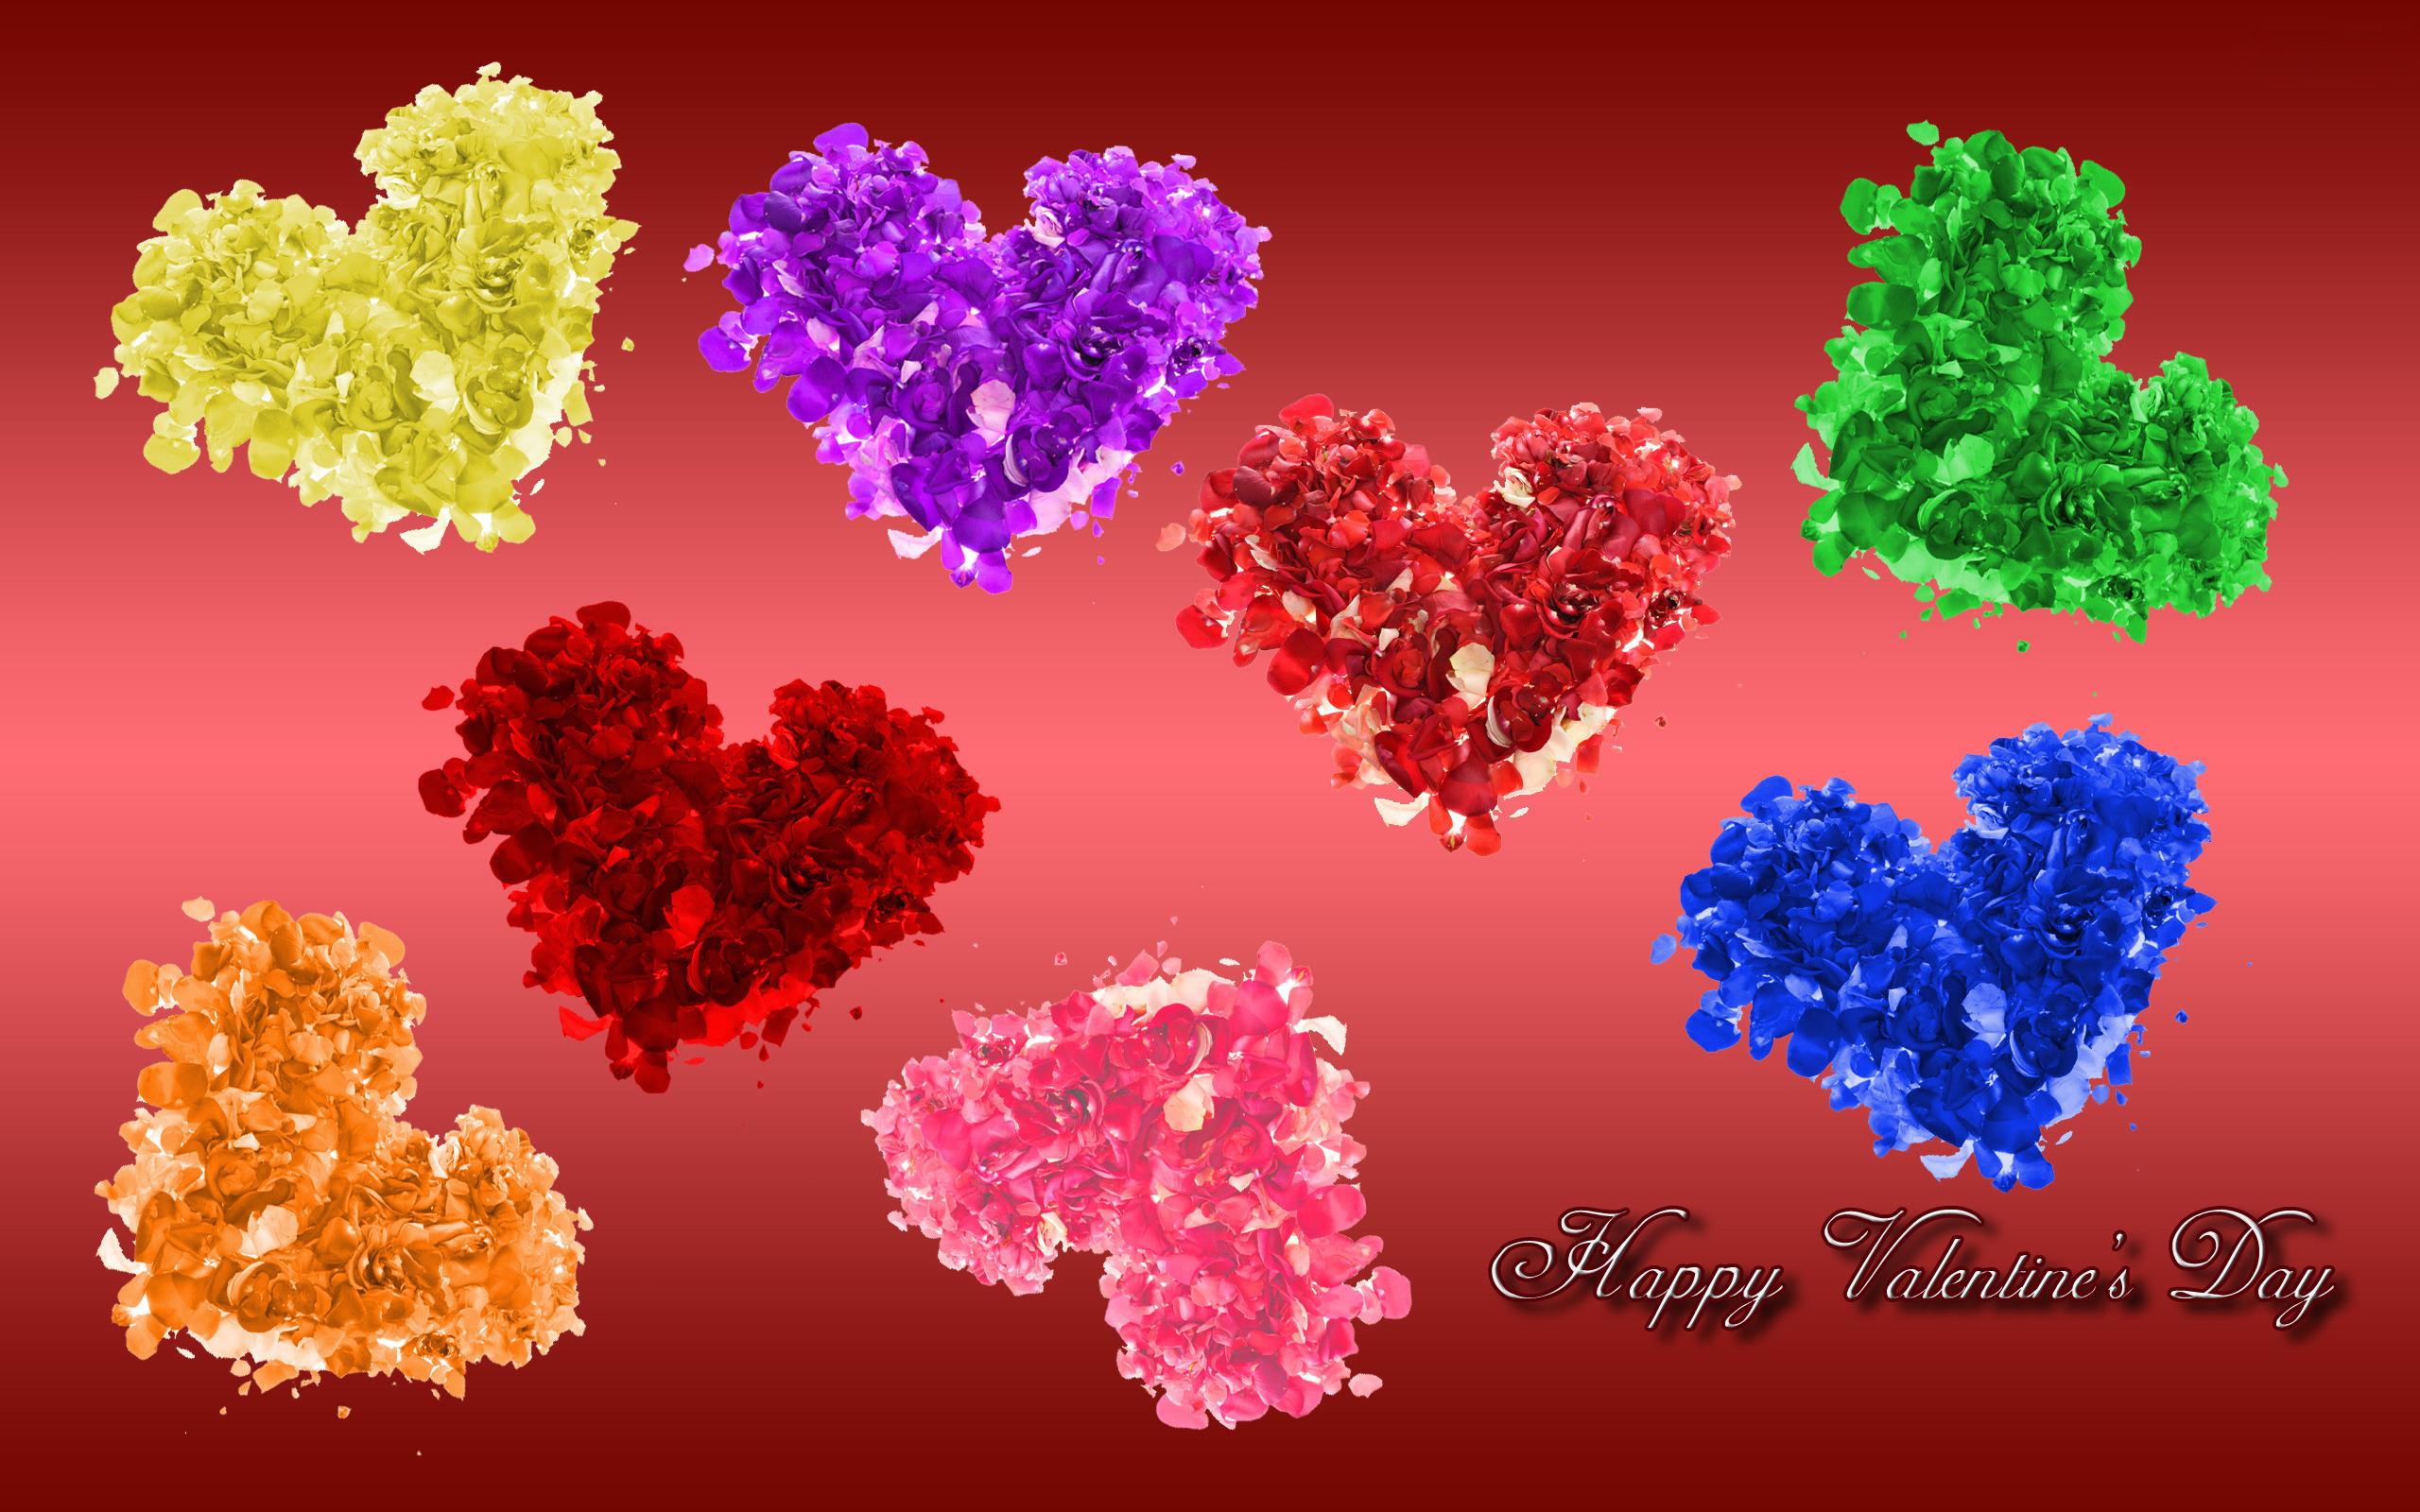 Cute Valentine Wallpaper For Computer   Picseriocom 2560x1600